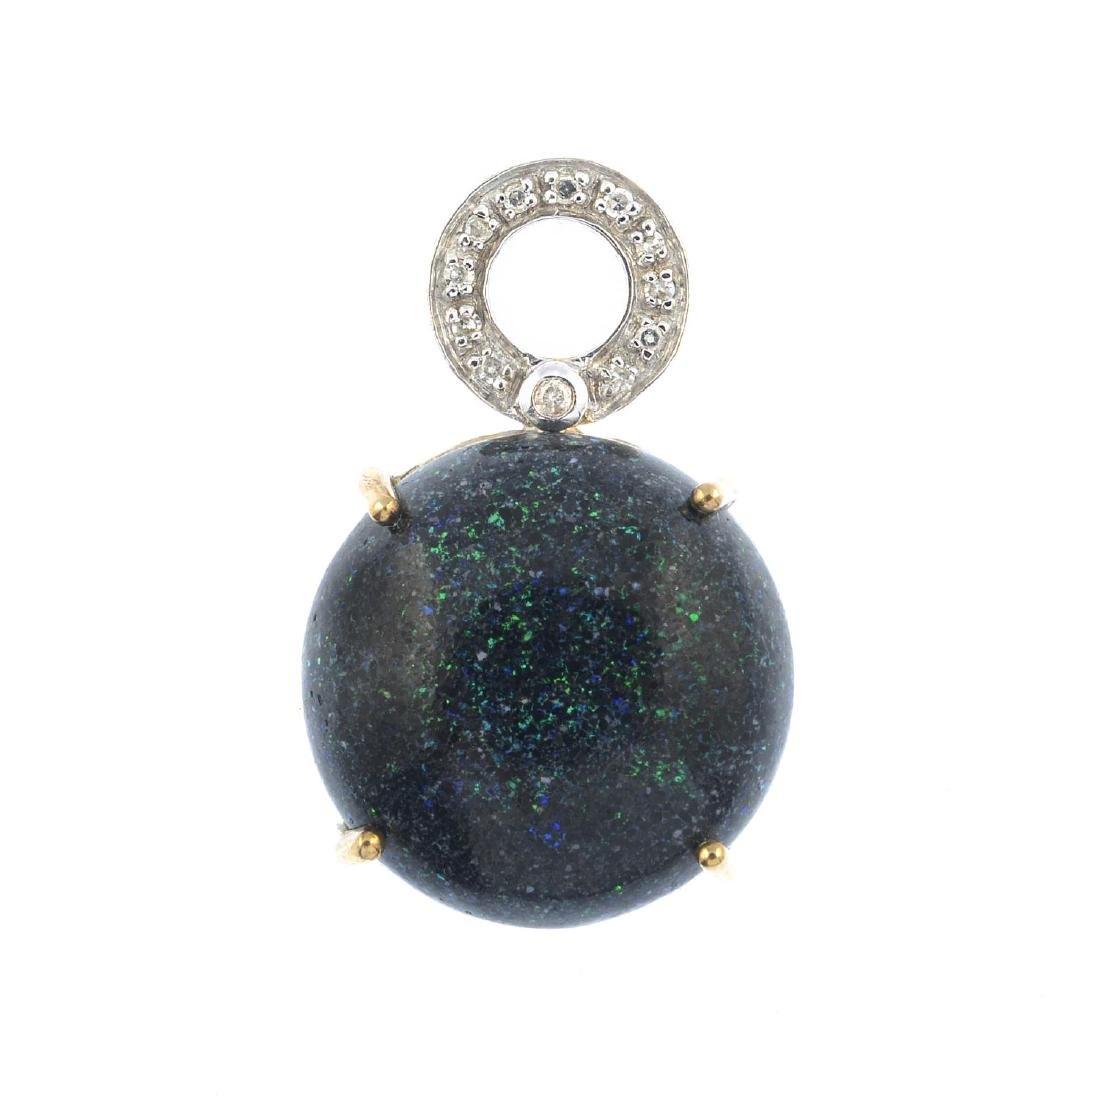 A treated opal and diamond pendant. The circular